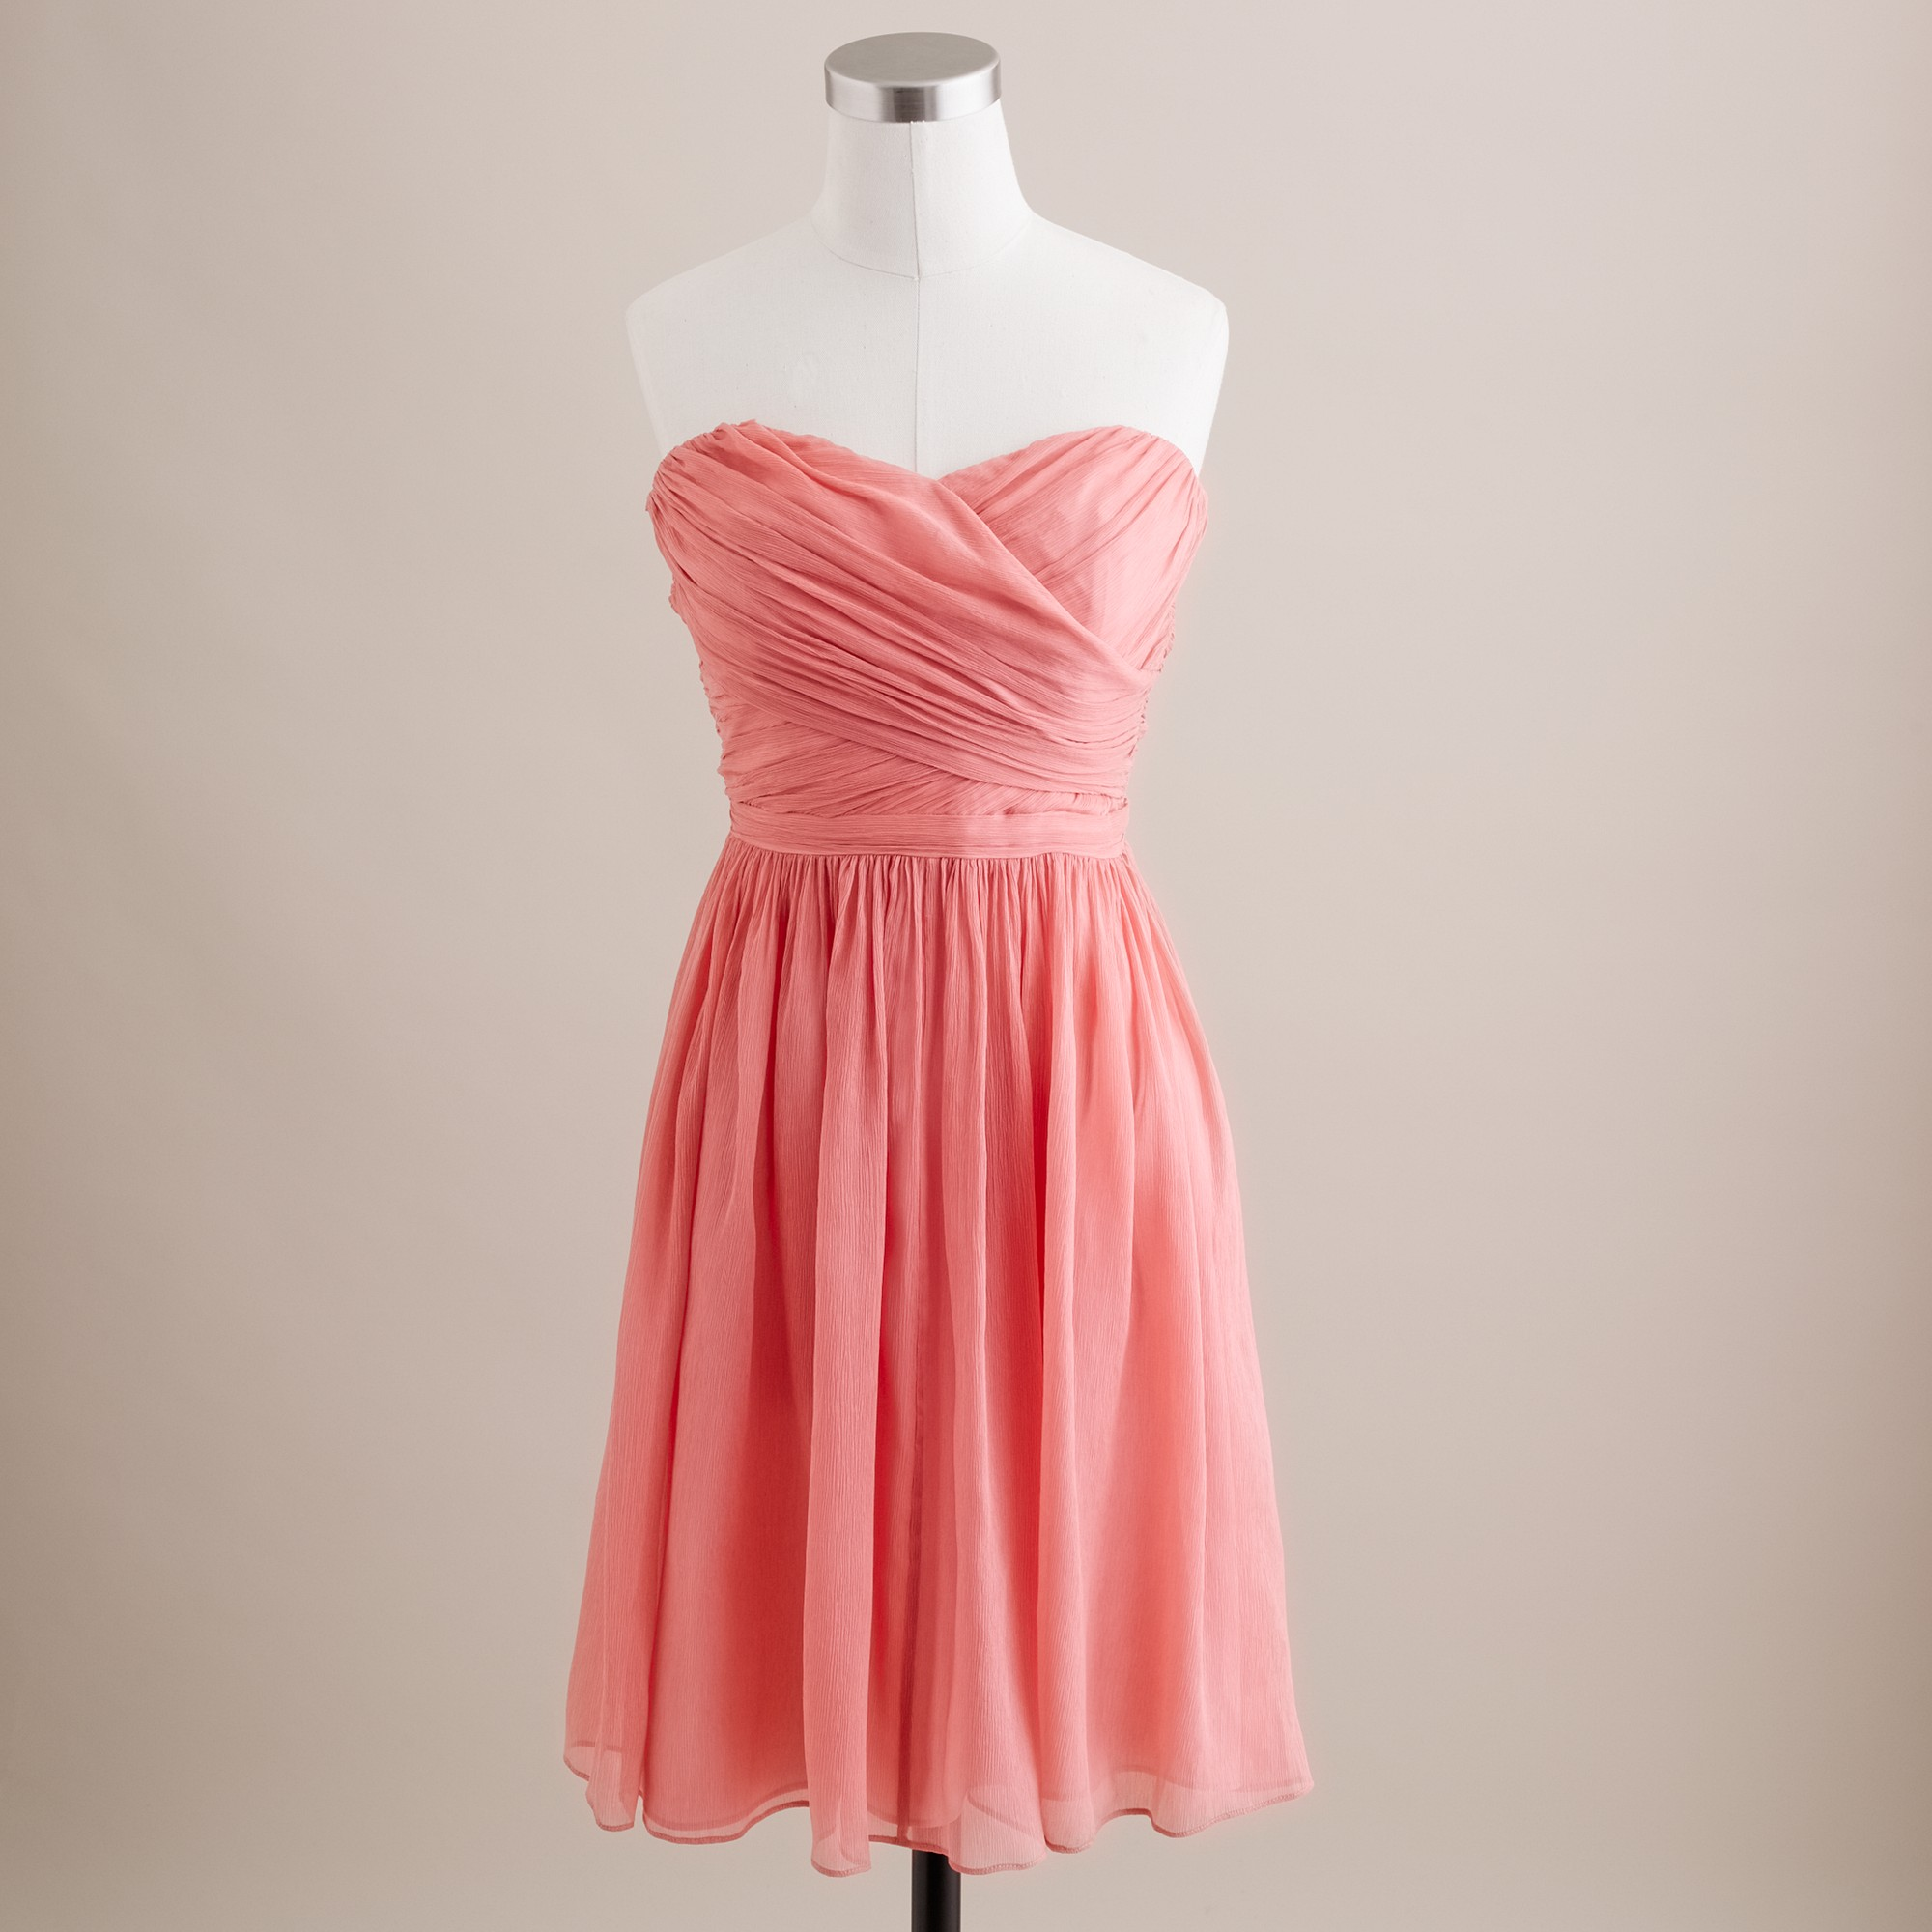 J.crew Arabelle Dress In Silk Chiffon In Pink (bright